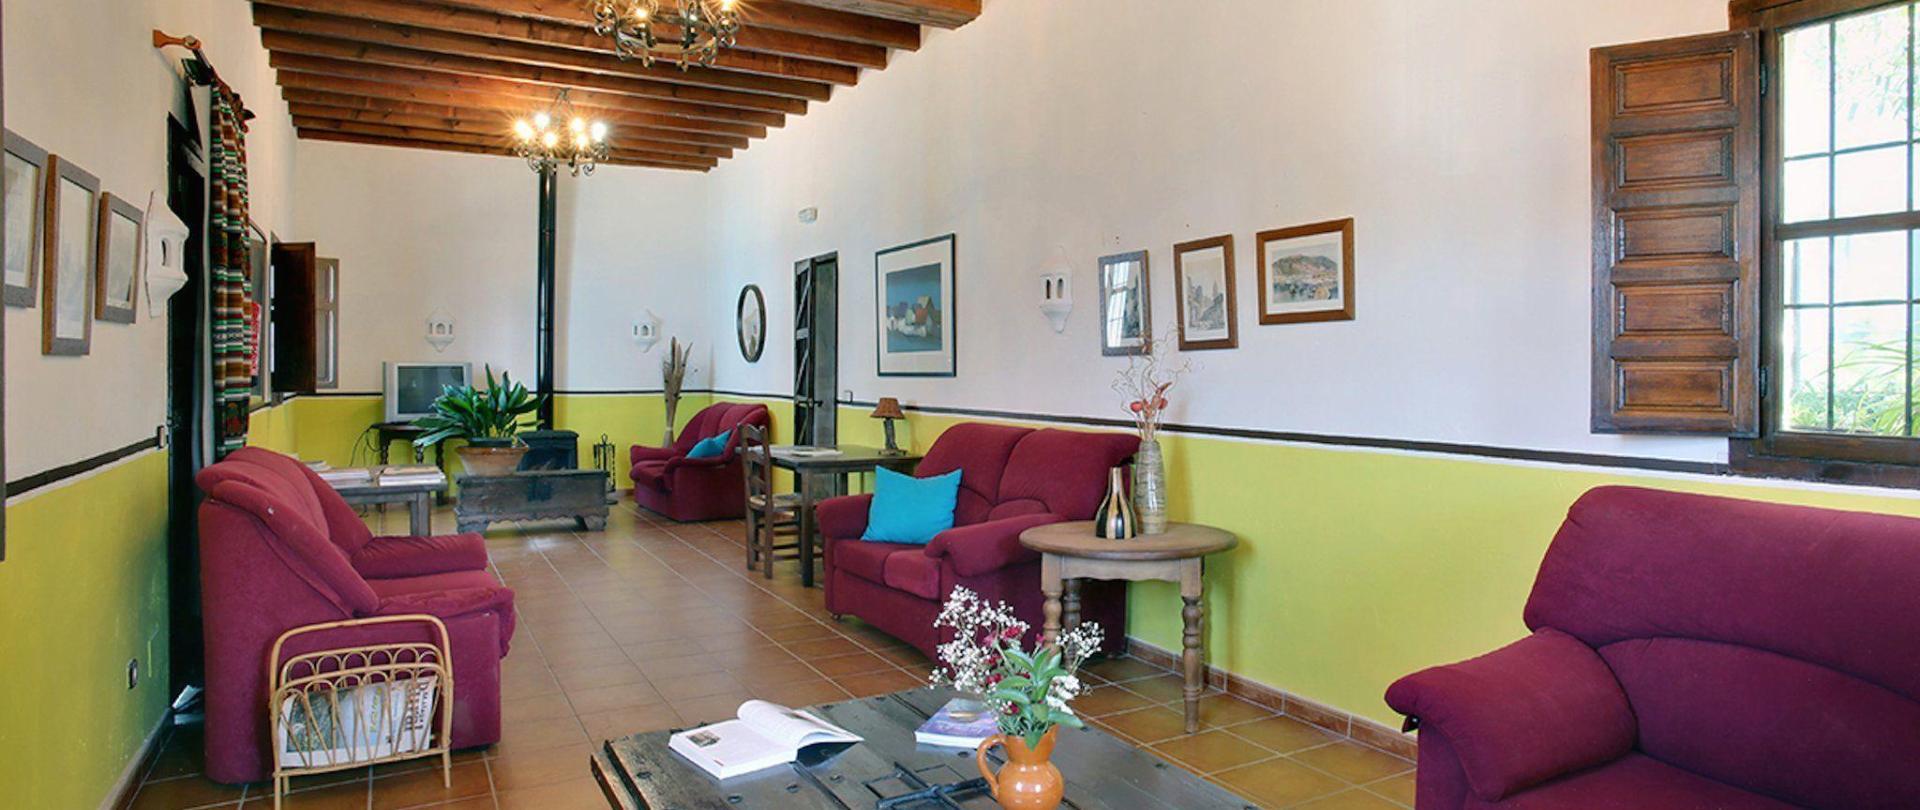 La Salita, common lounge